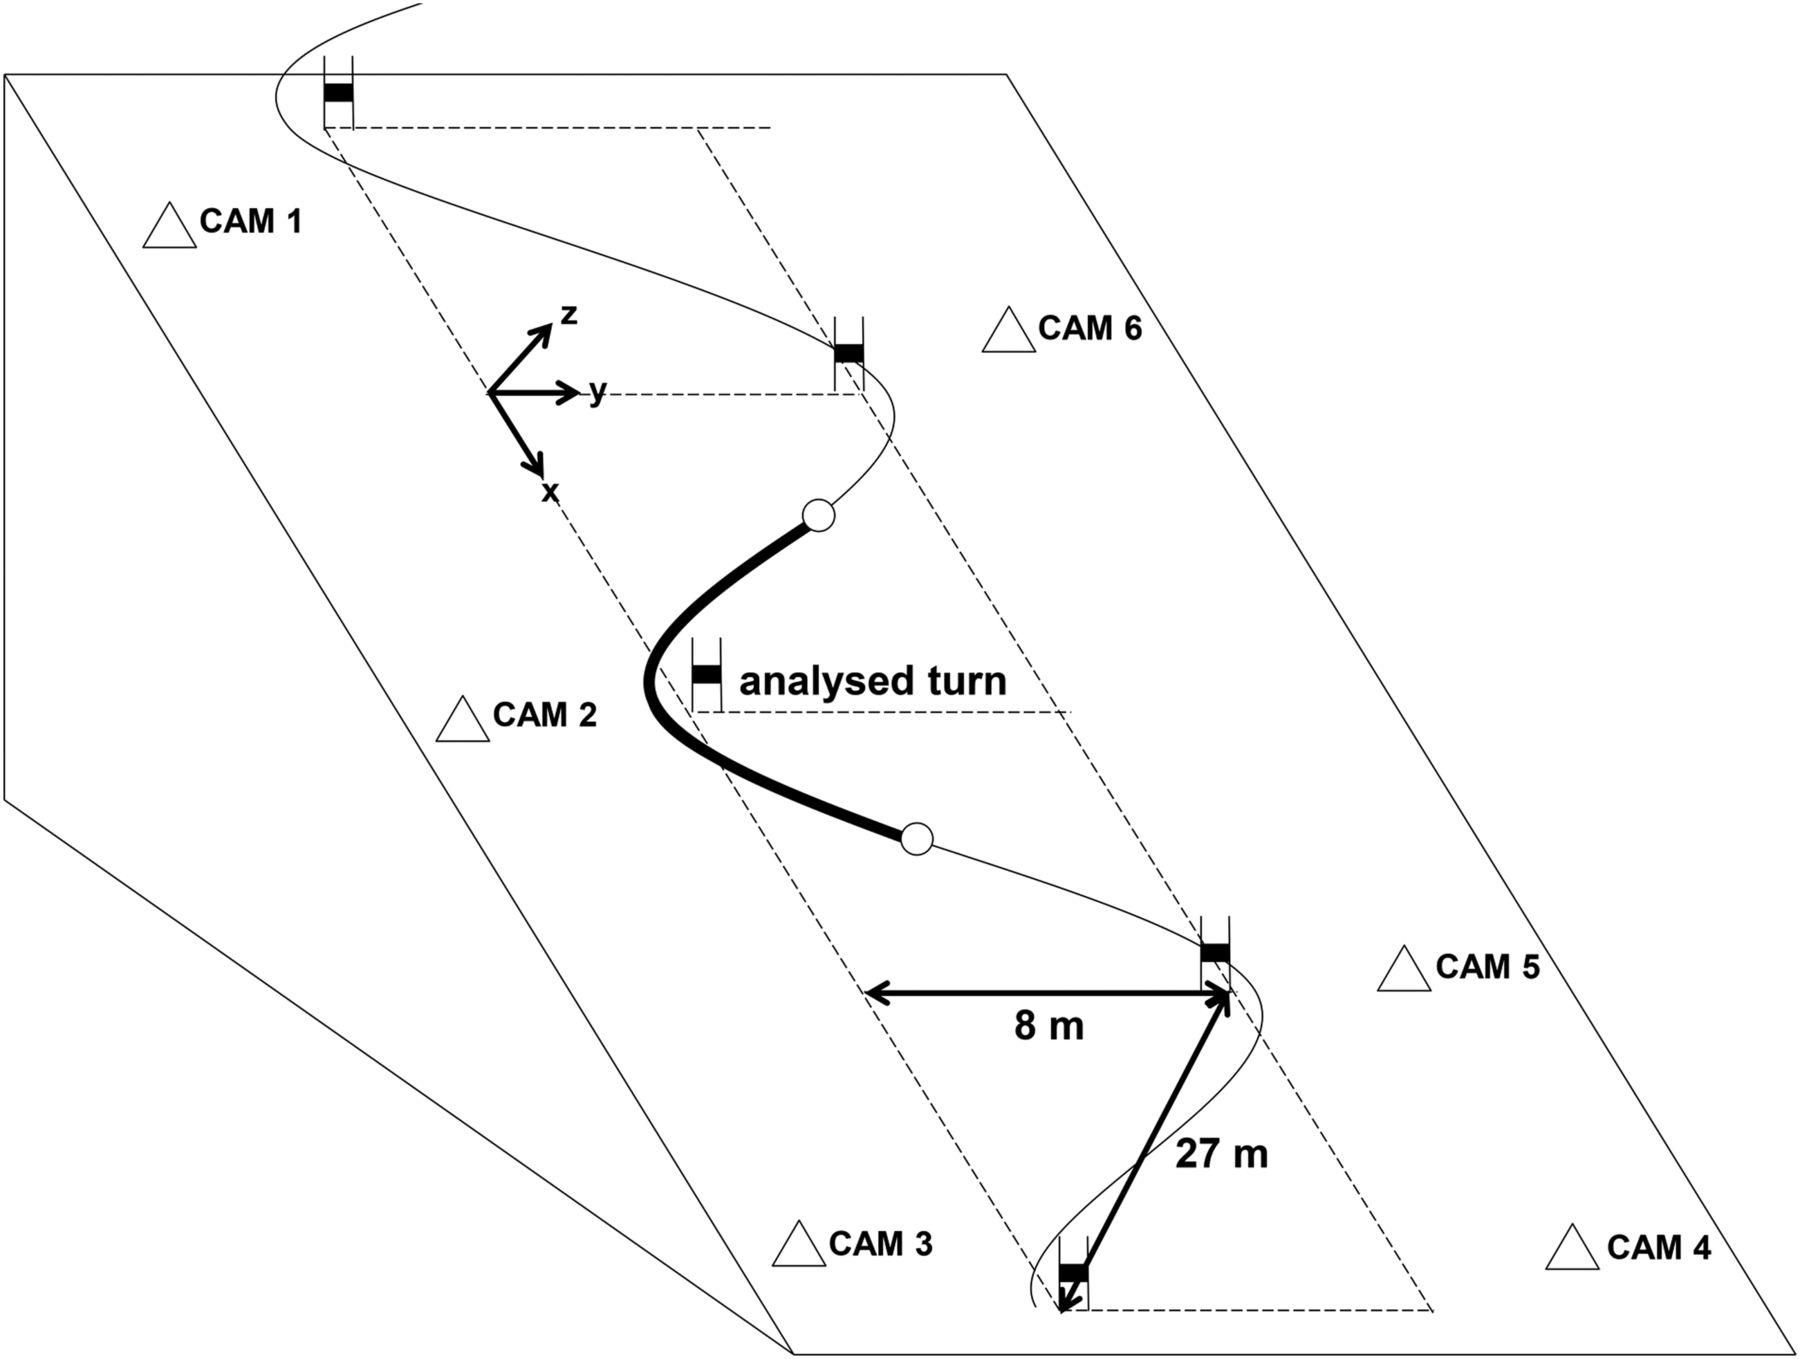 sidecut radius and the mechanics of turning u2014equipment designed to reduce risk of severe